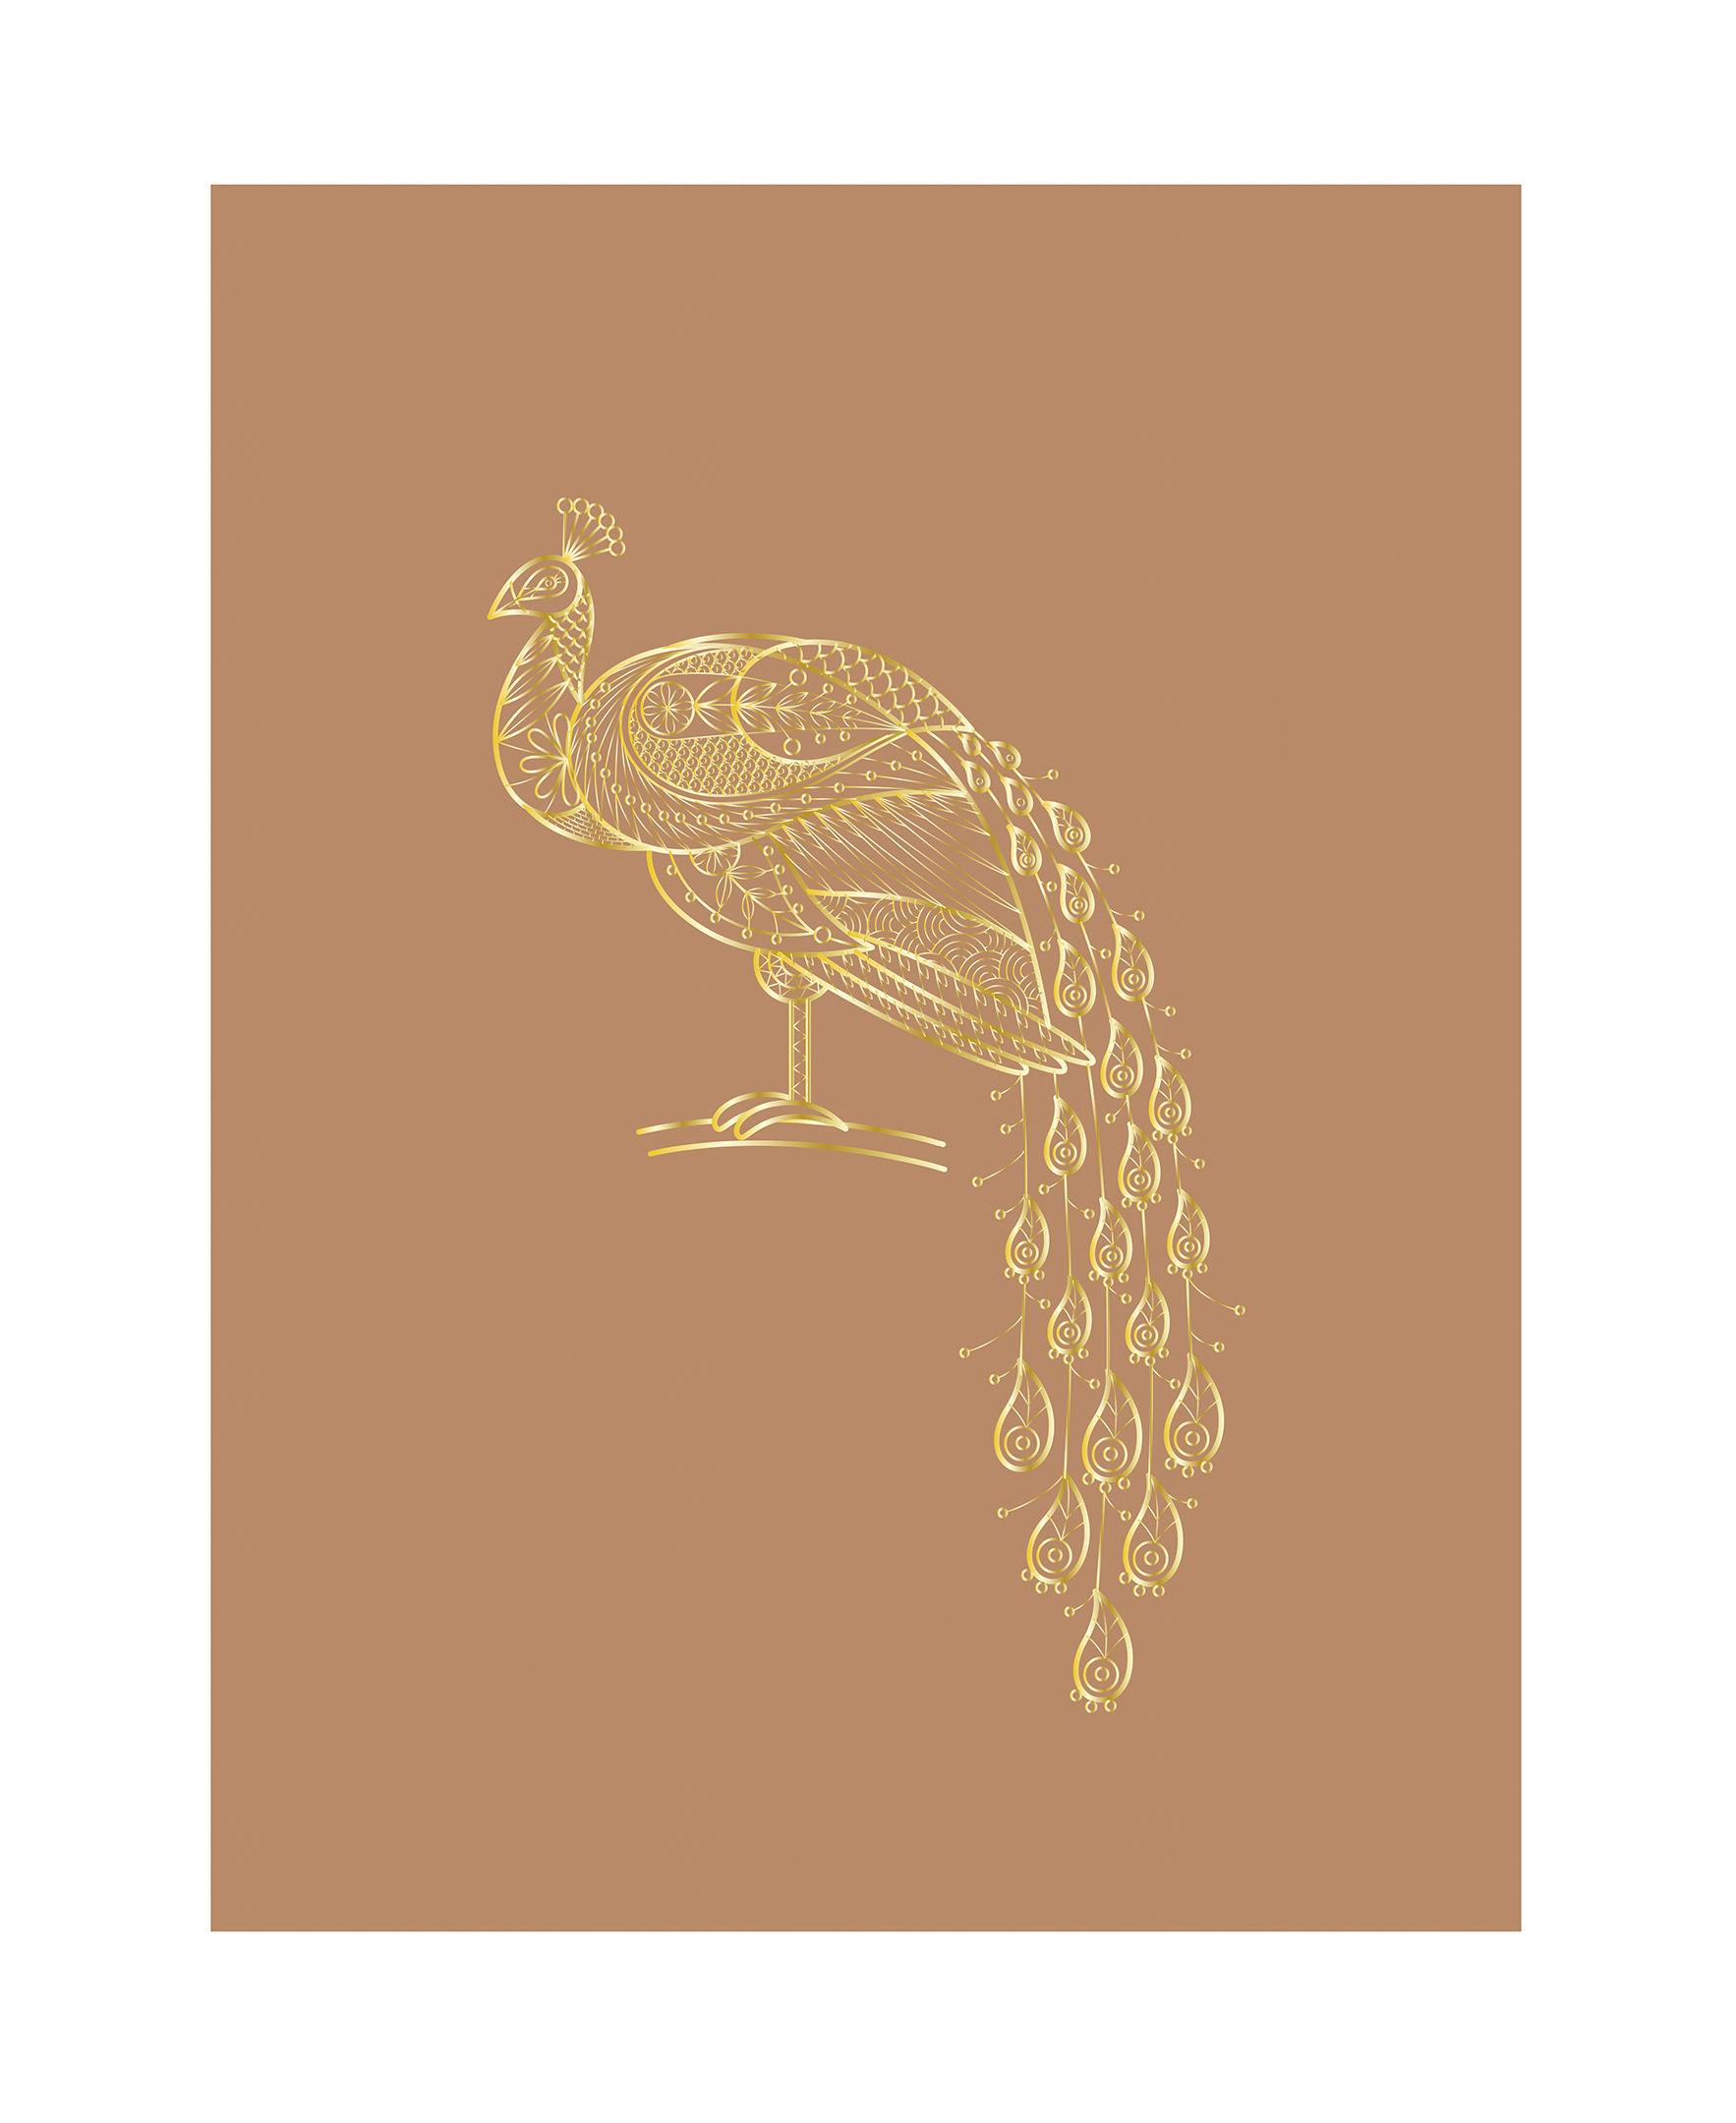 Interni - Sticker - Poster - / Pavone - 30 x 40 cm di Bloomingville - Pavone / Marrone - Carta